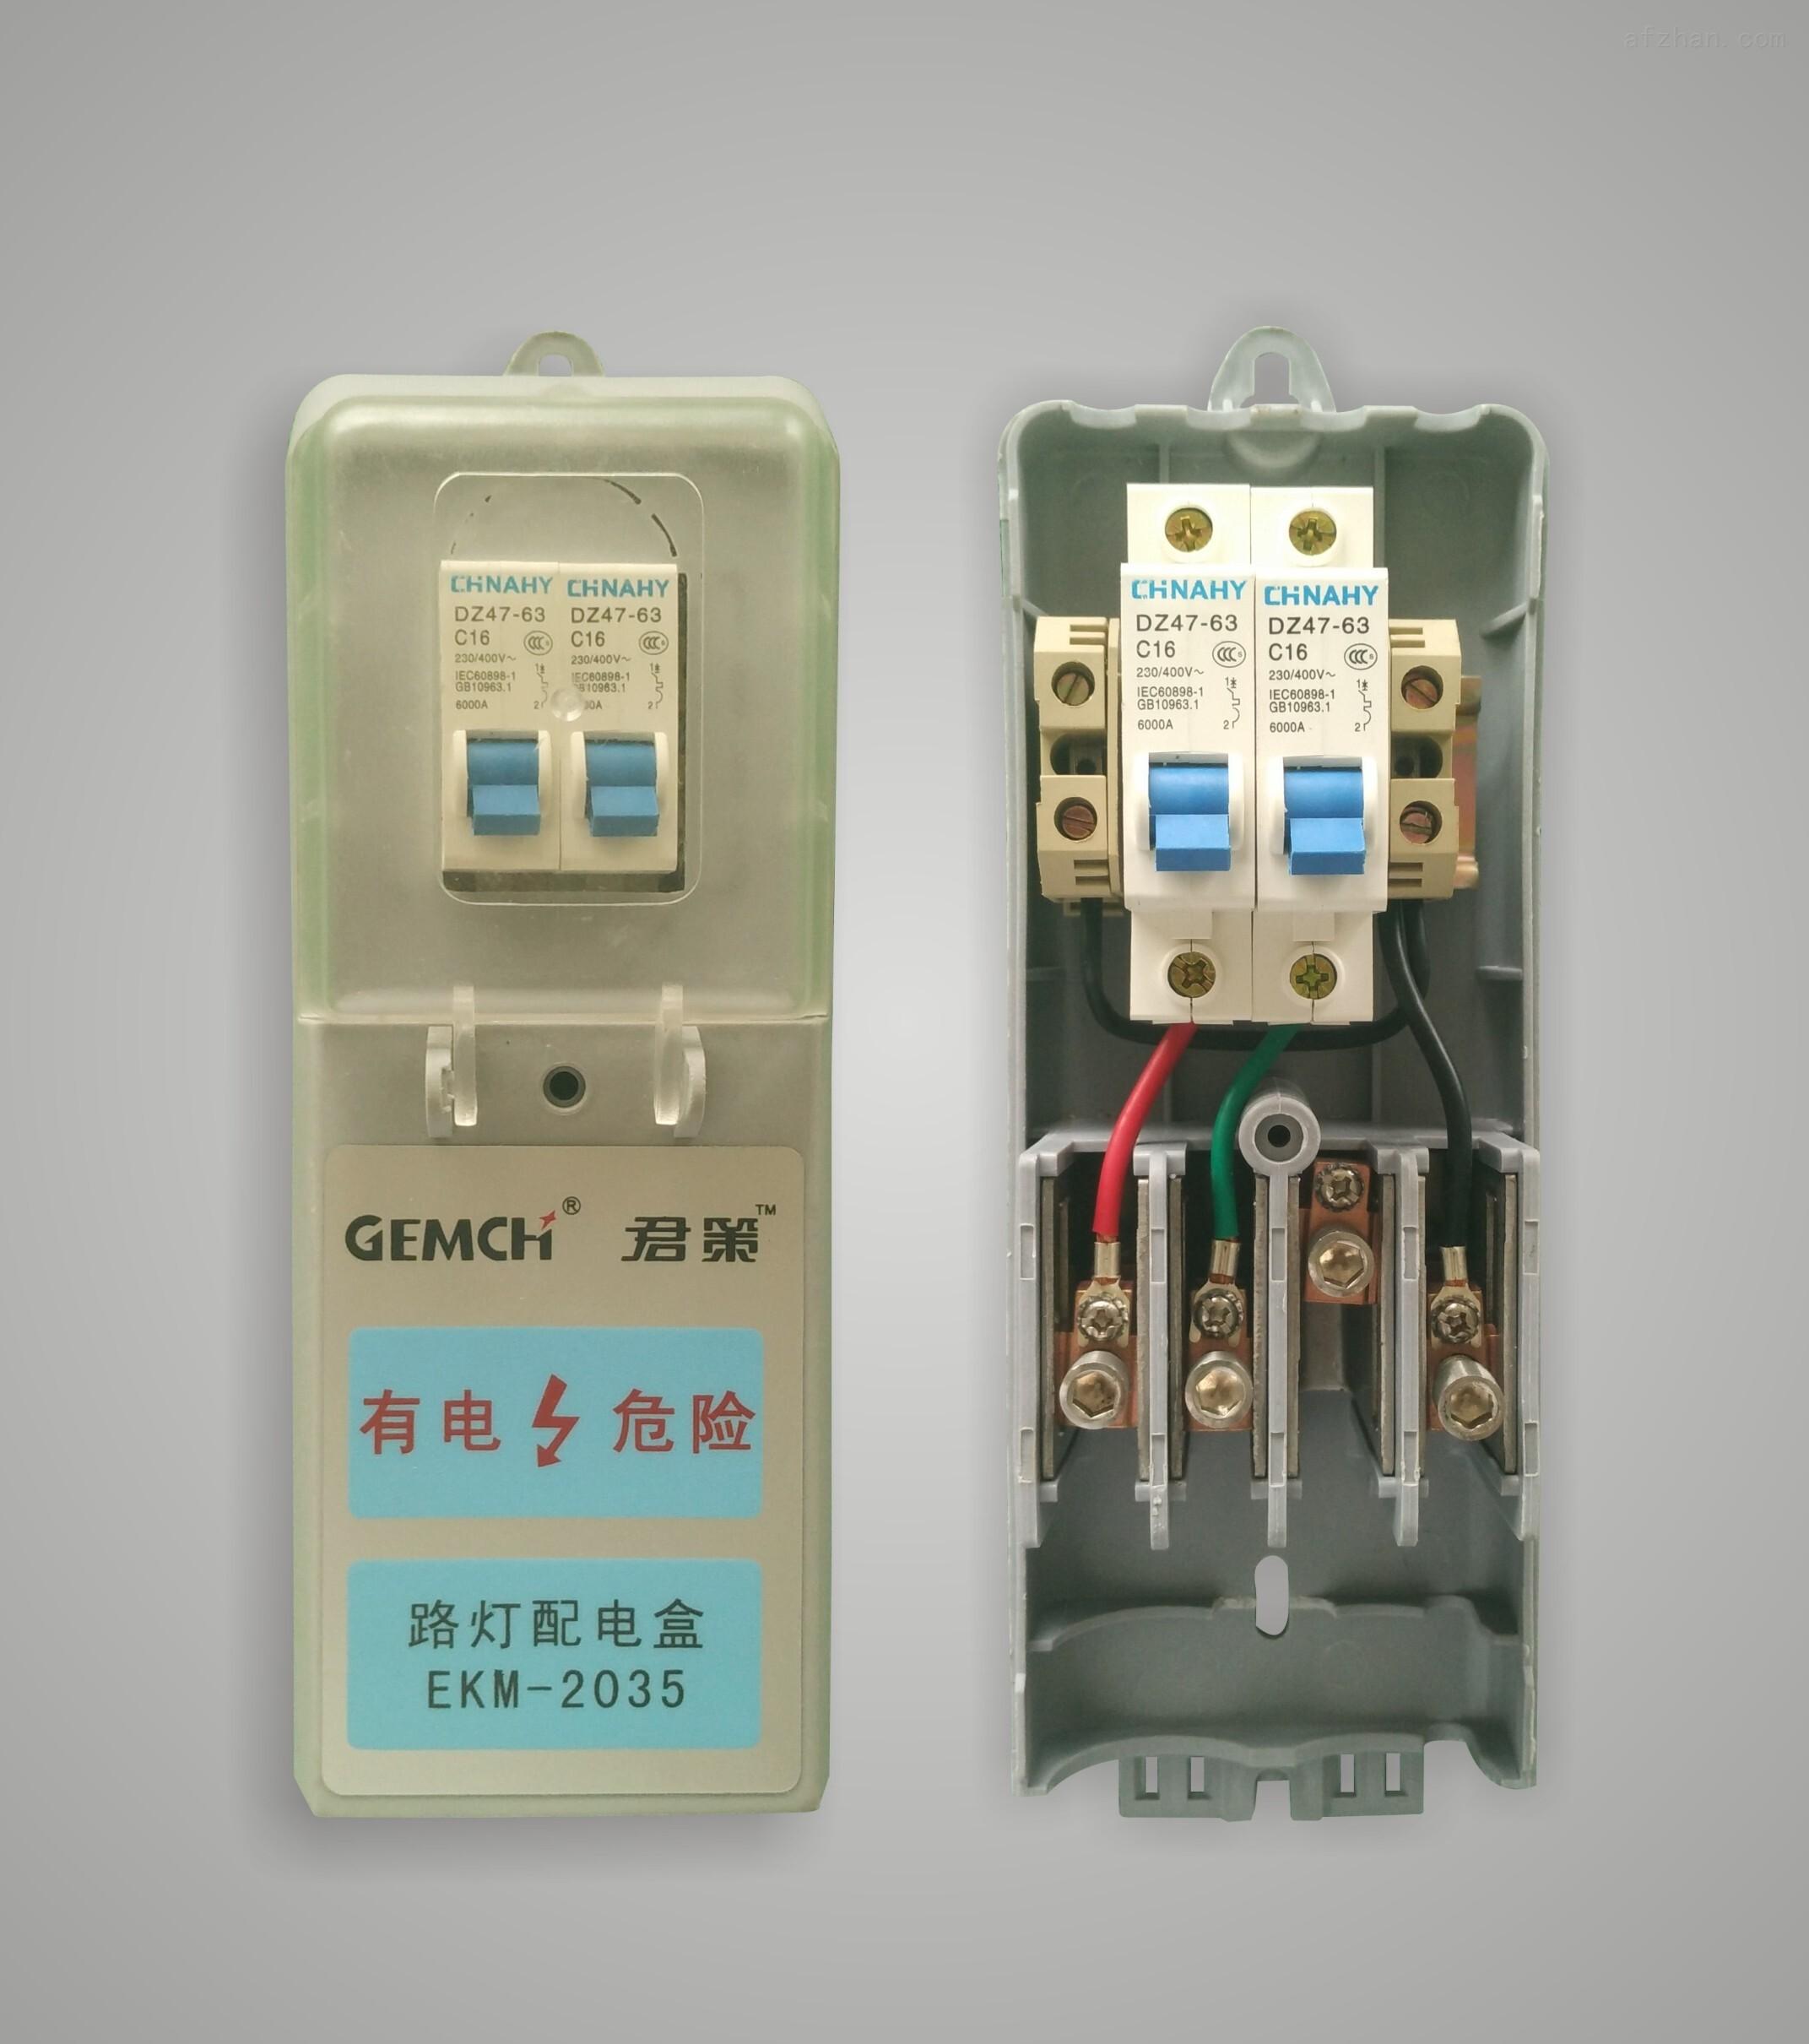 ekm2035路灯配电盒 ekm2035路灯电缆接线盒